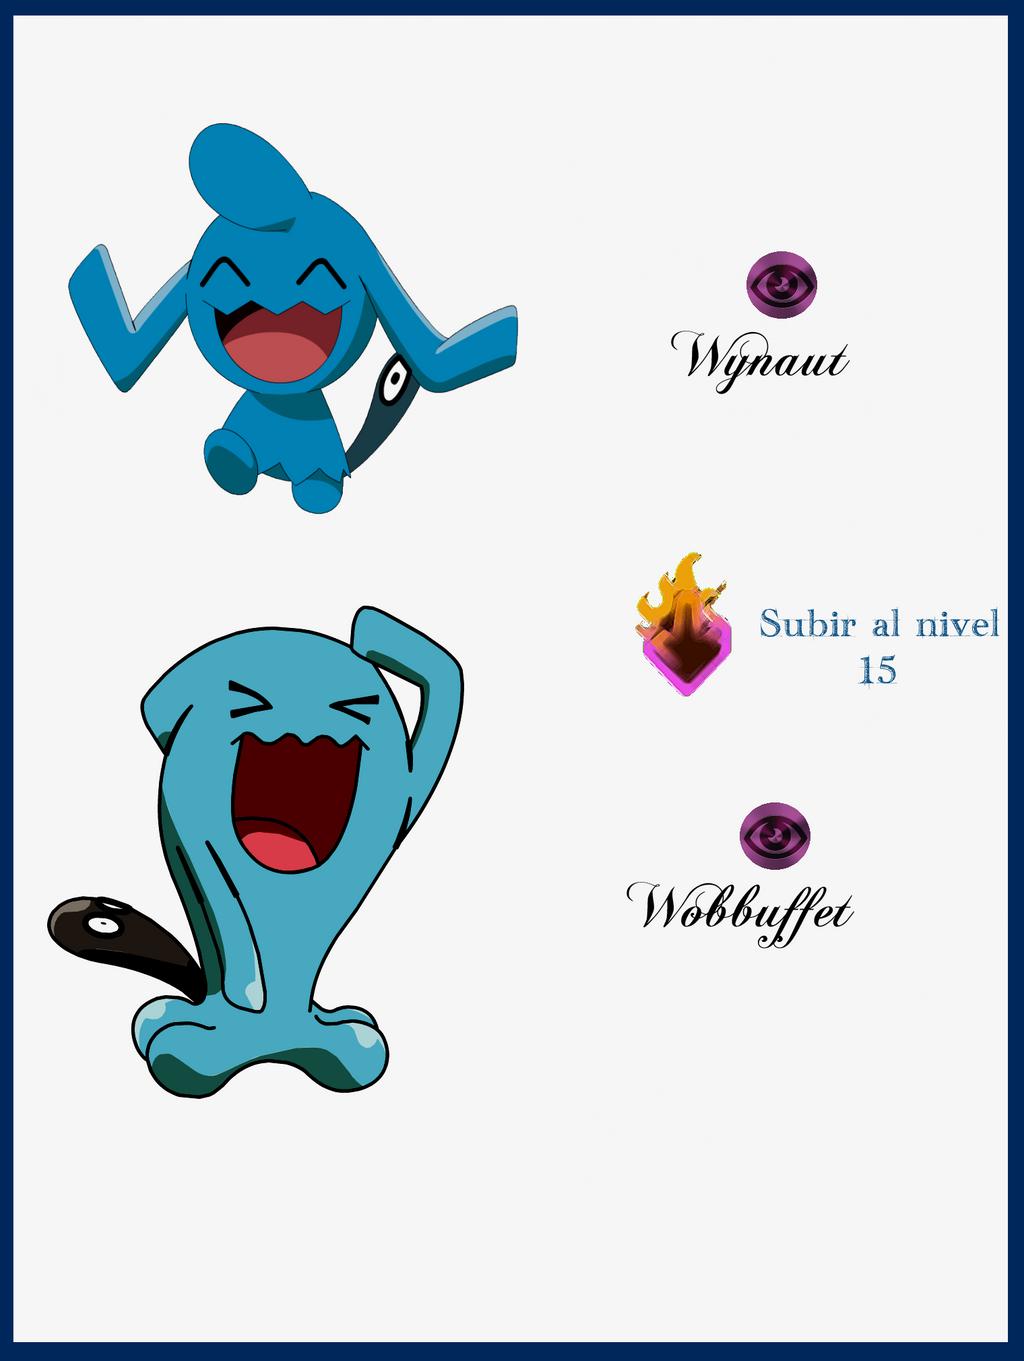 095 Whynaut Evoluciones by Maxconnery on DeviantArt Wailmer Pokemon Evolution Chart